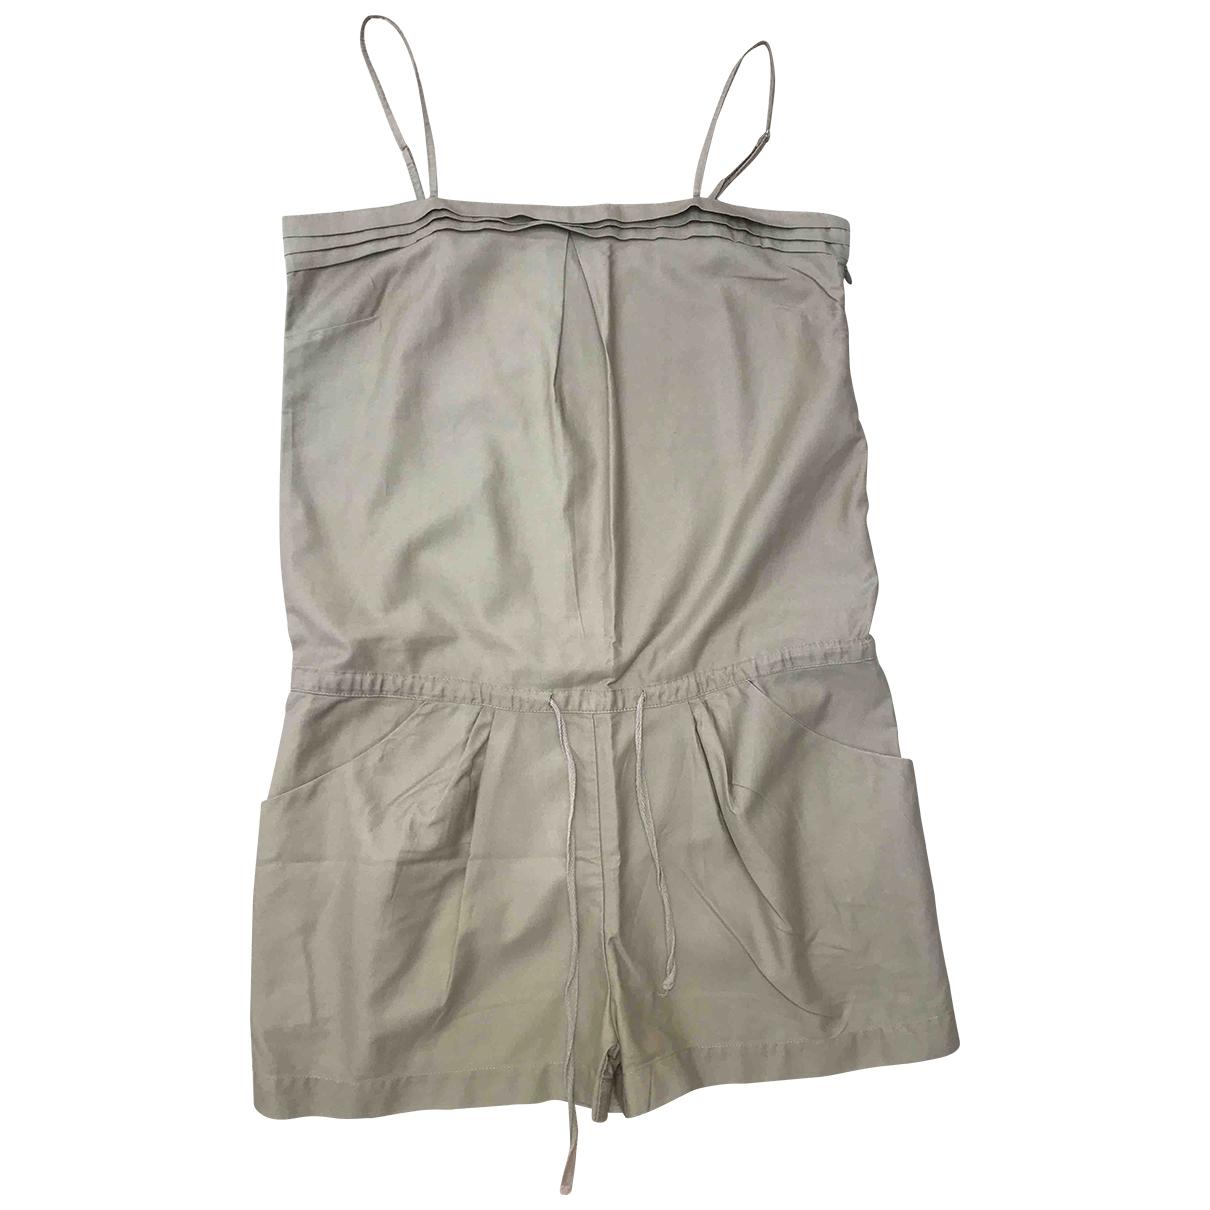 Sandro \N Beige Cotton jumpsuit for Women 2 0-5